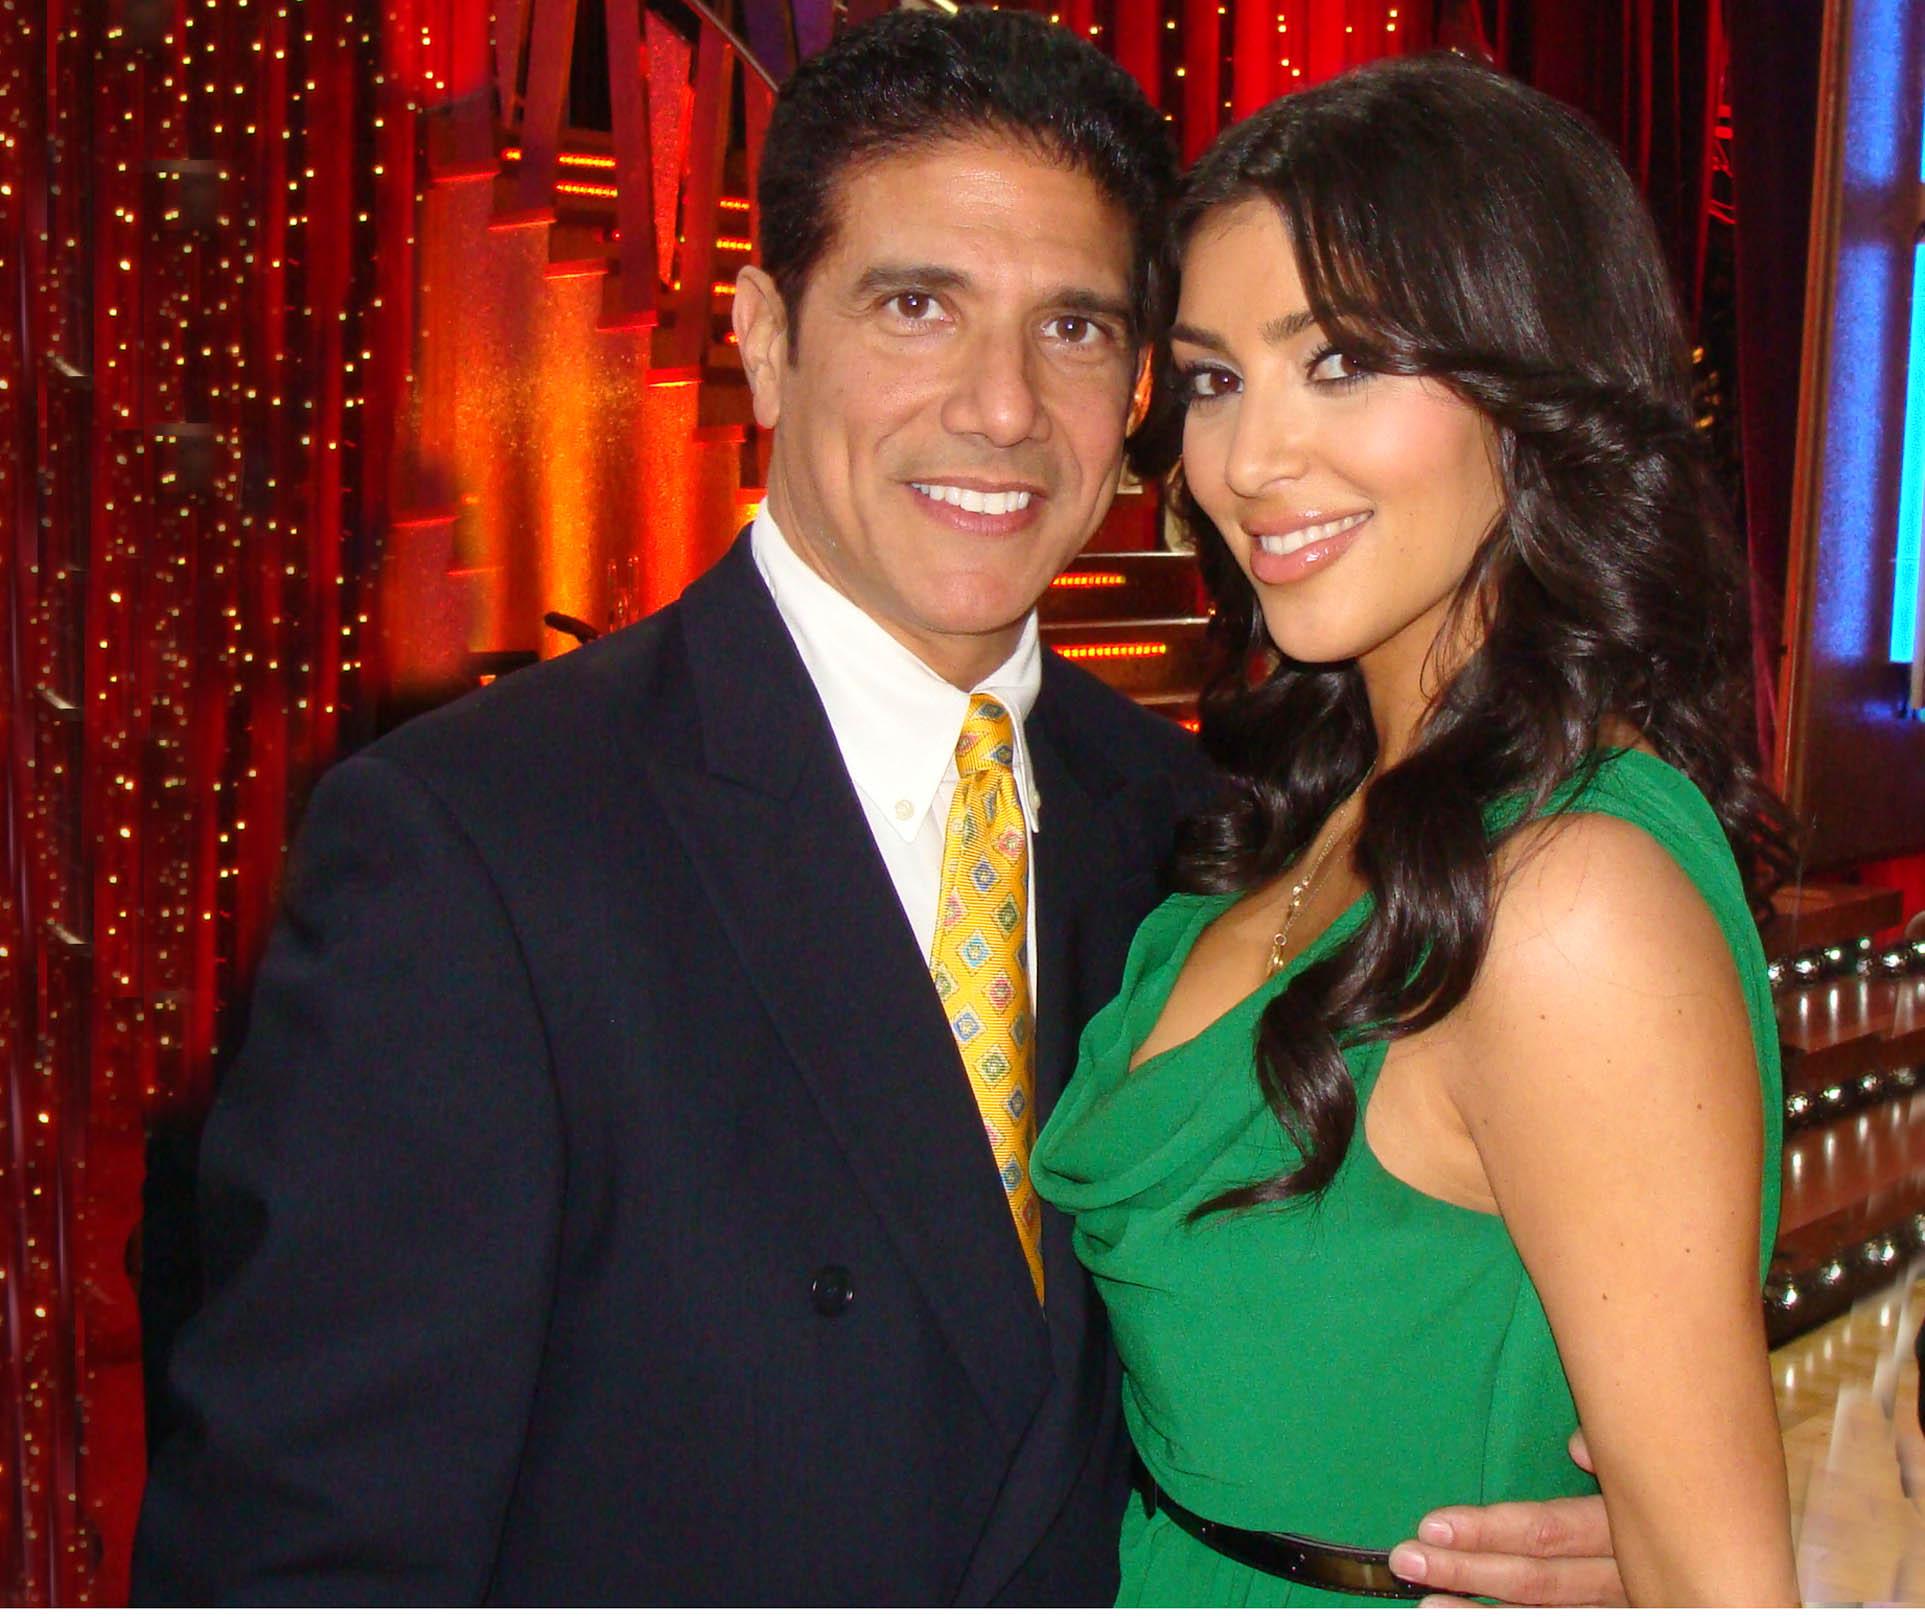 Corky Kim Kardashian